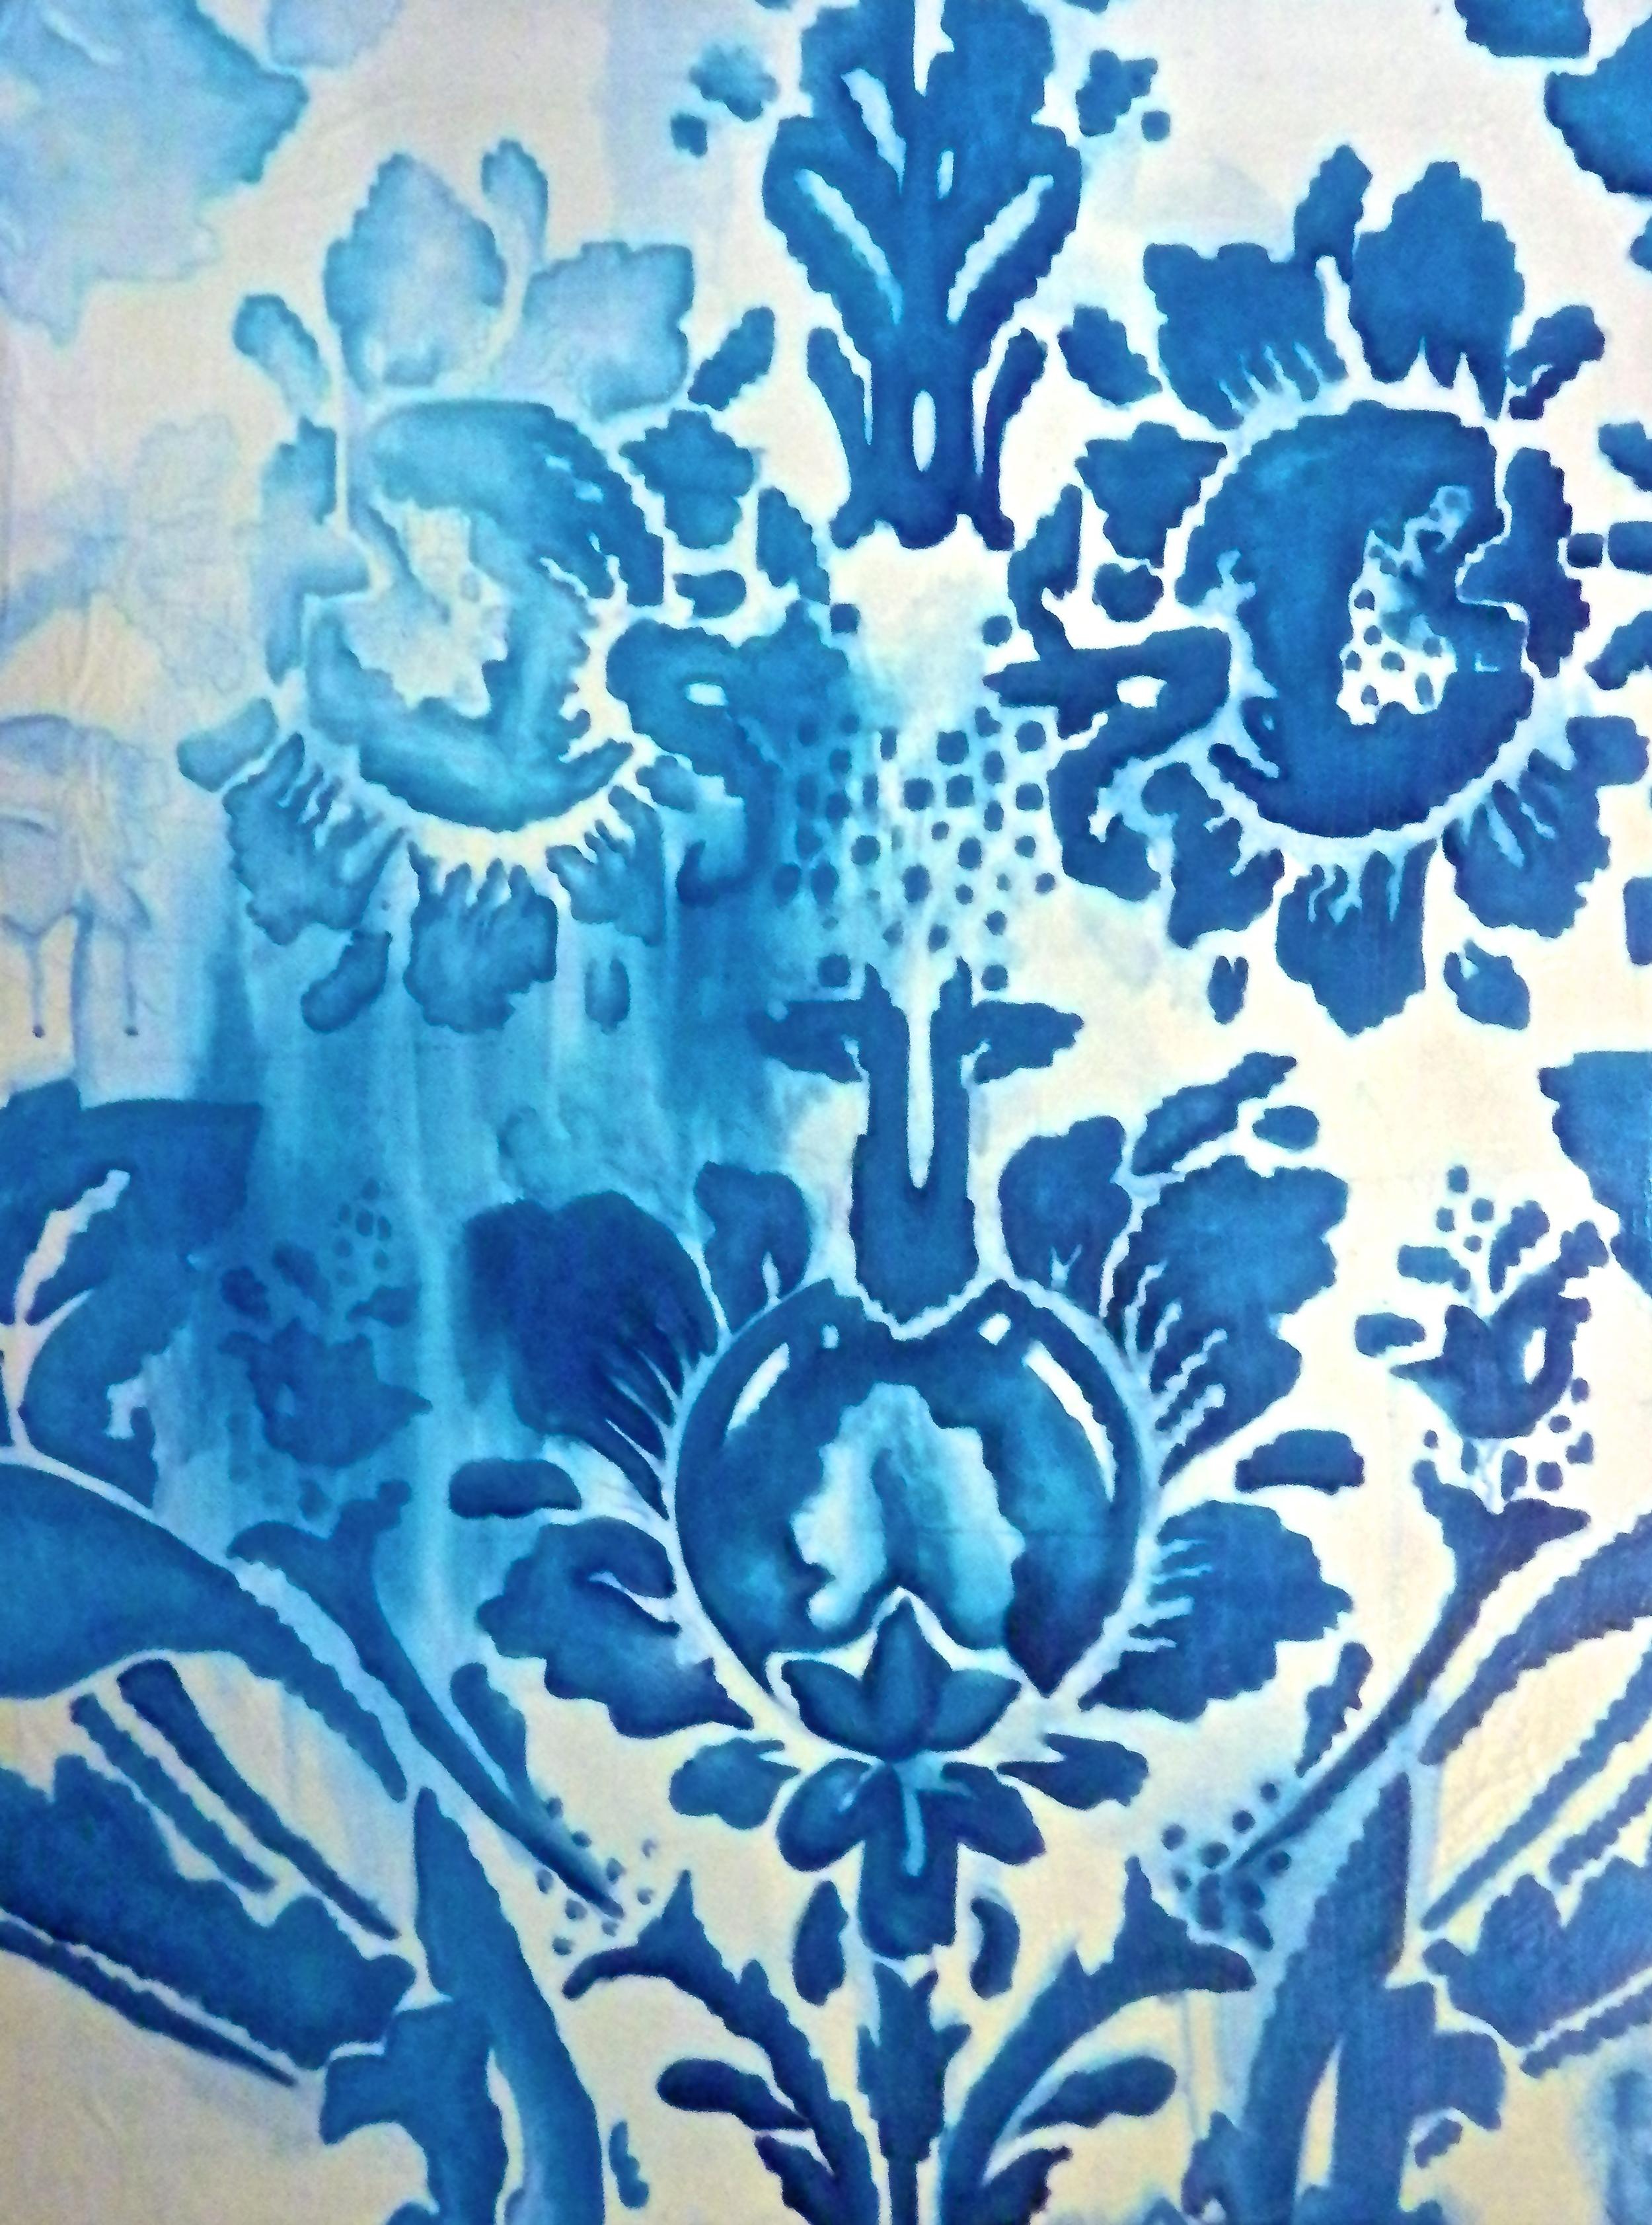 Pixilated Blue Print